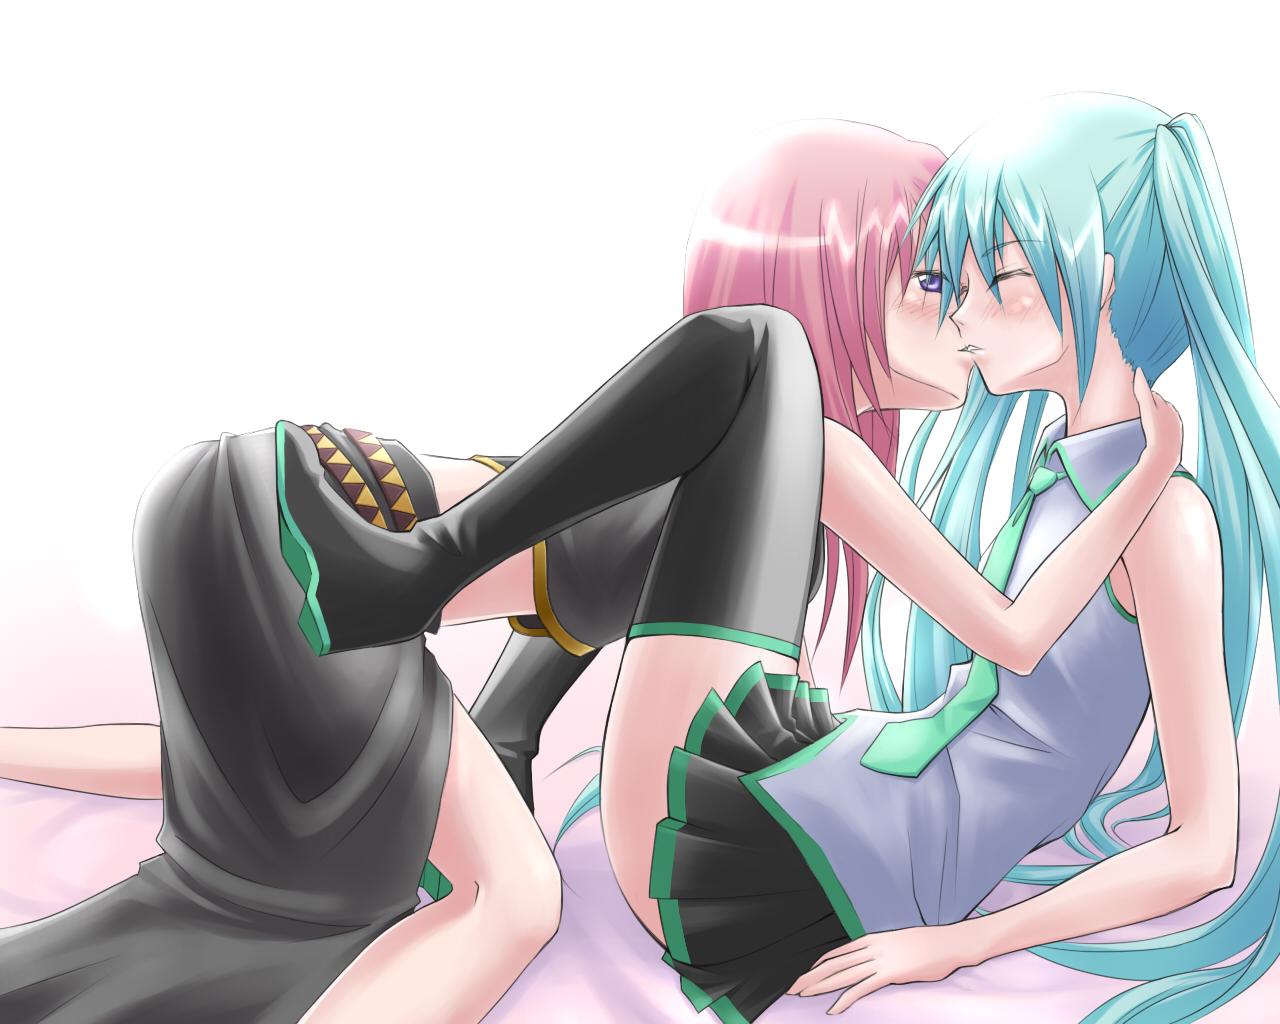 aqua_hair blush boots hatsune_miku kiss komaki_kureha long_hair megurine_luka pink_hair shoujo_ai skirt tie twintails vocaloid